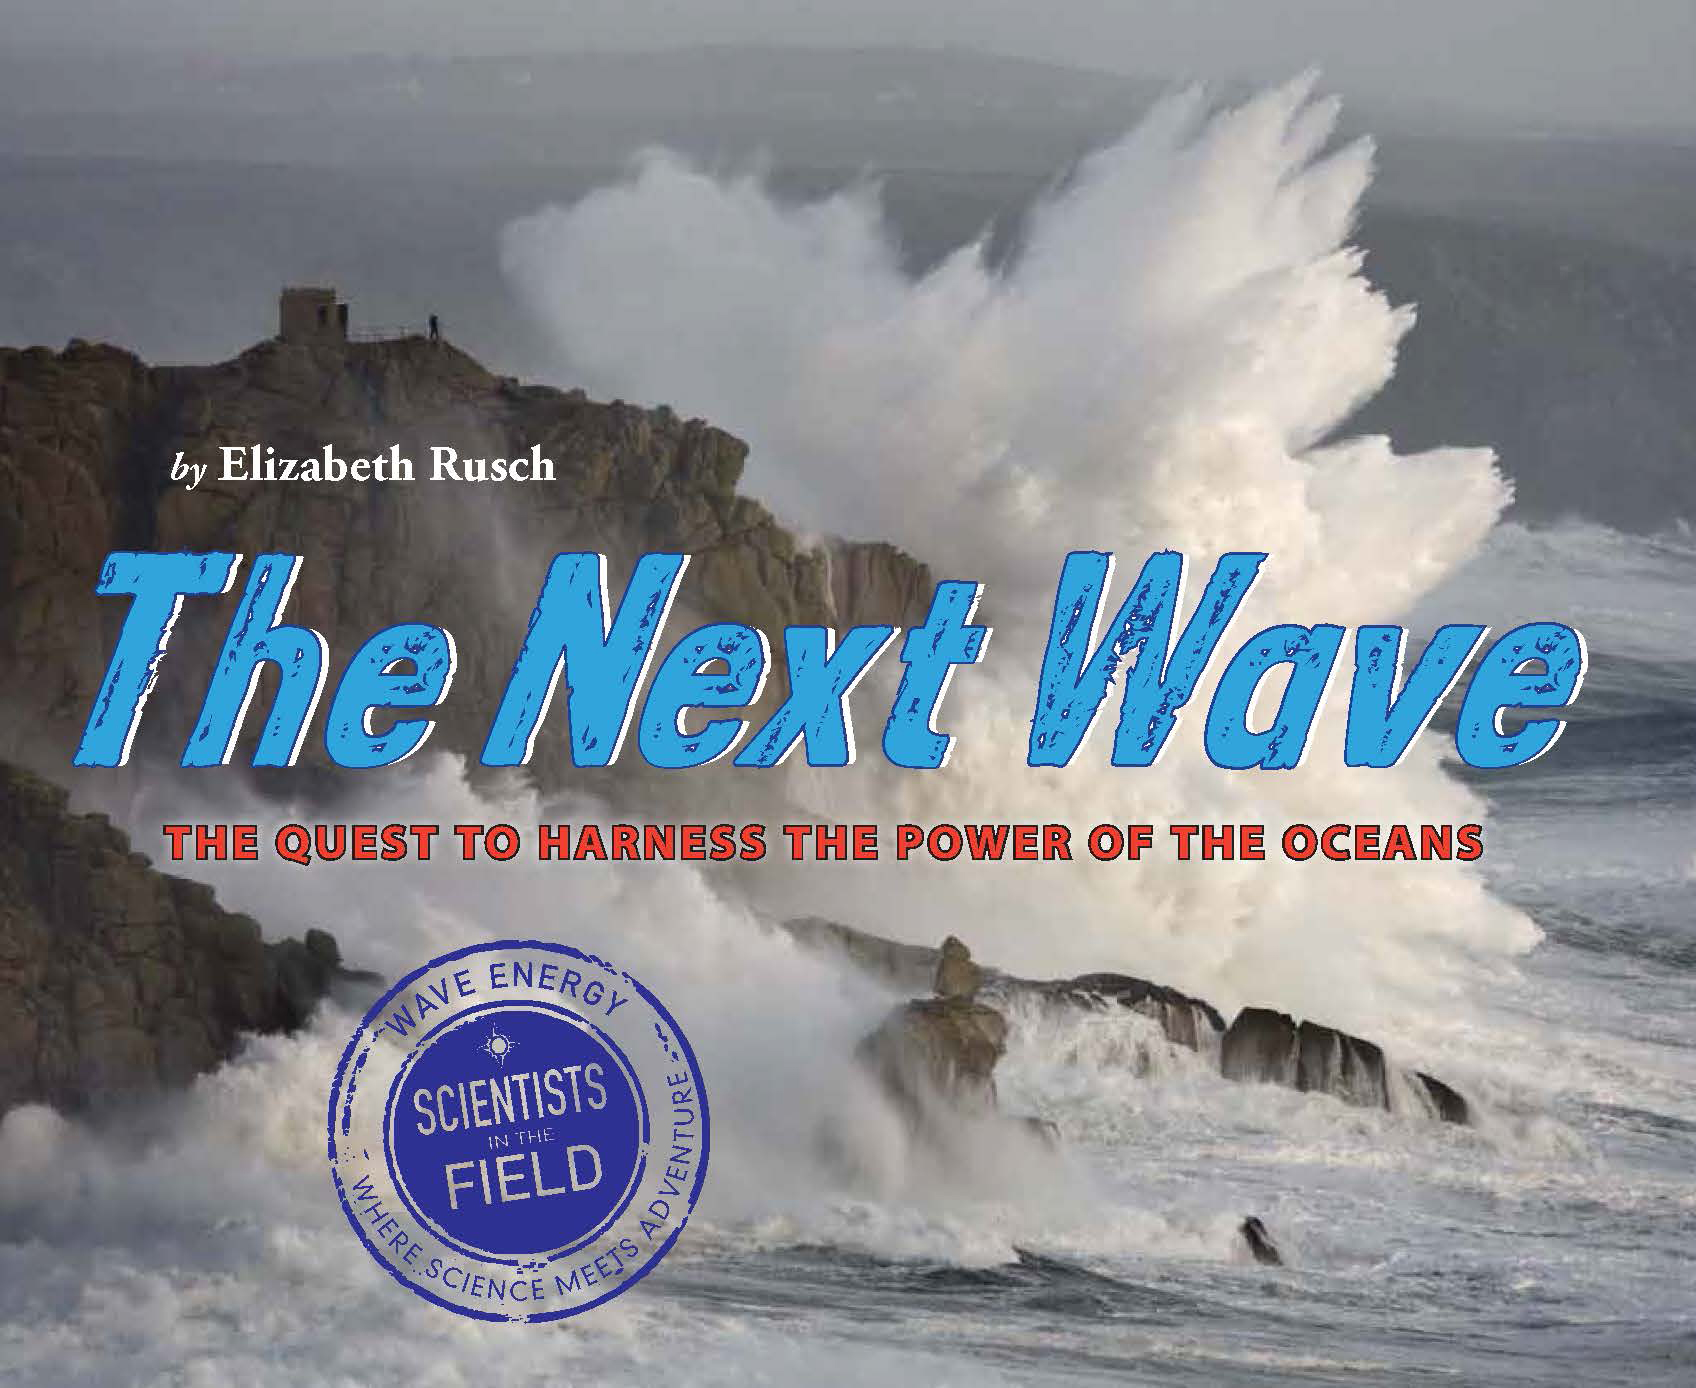 COVER FINAL FEB 2014